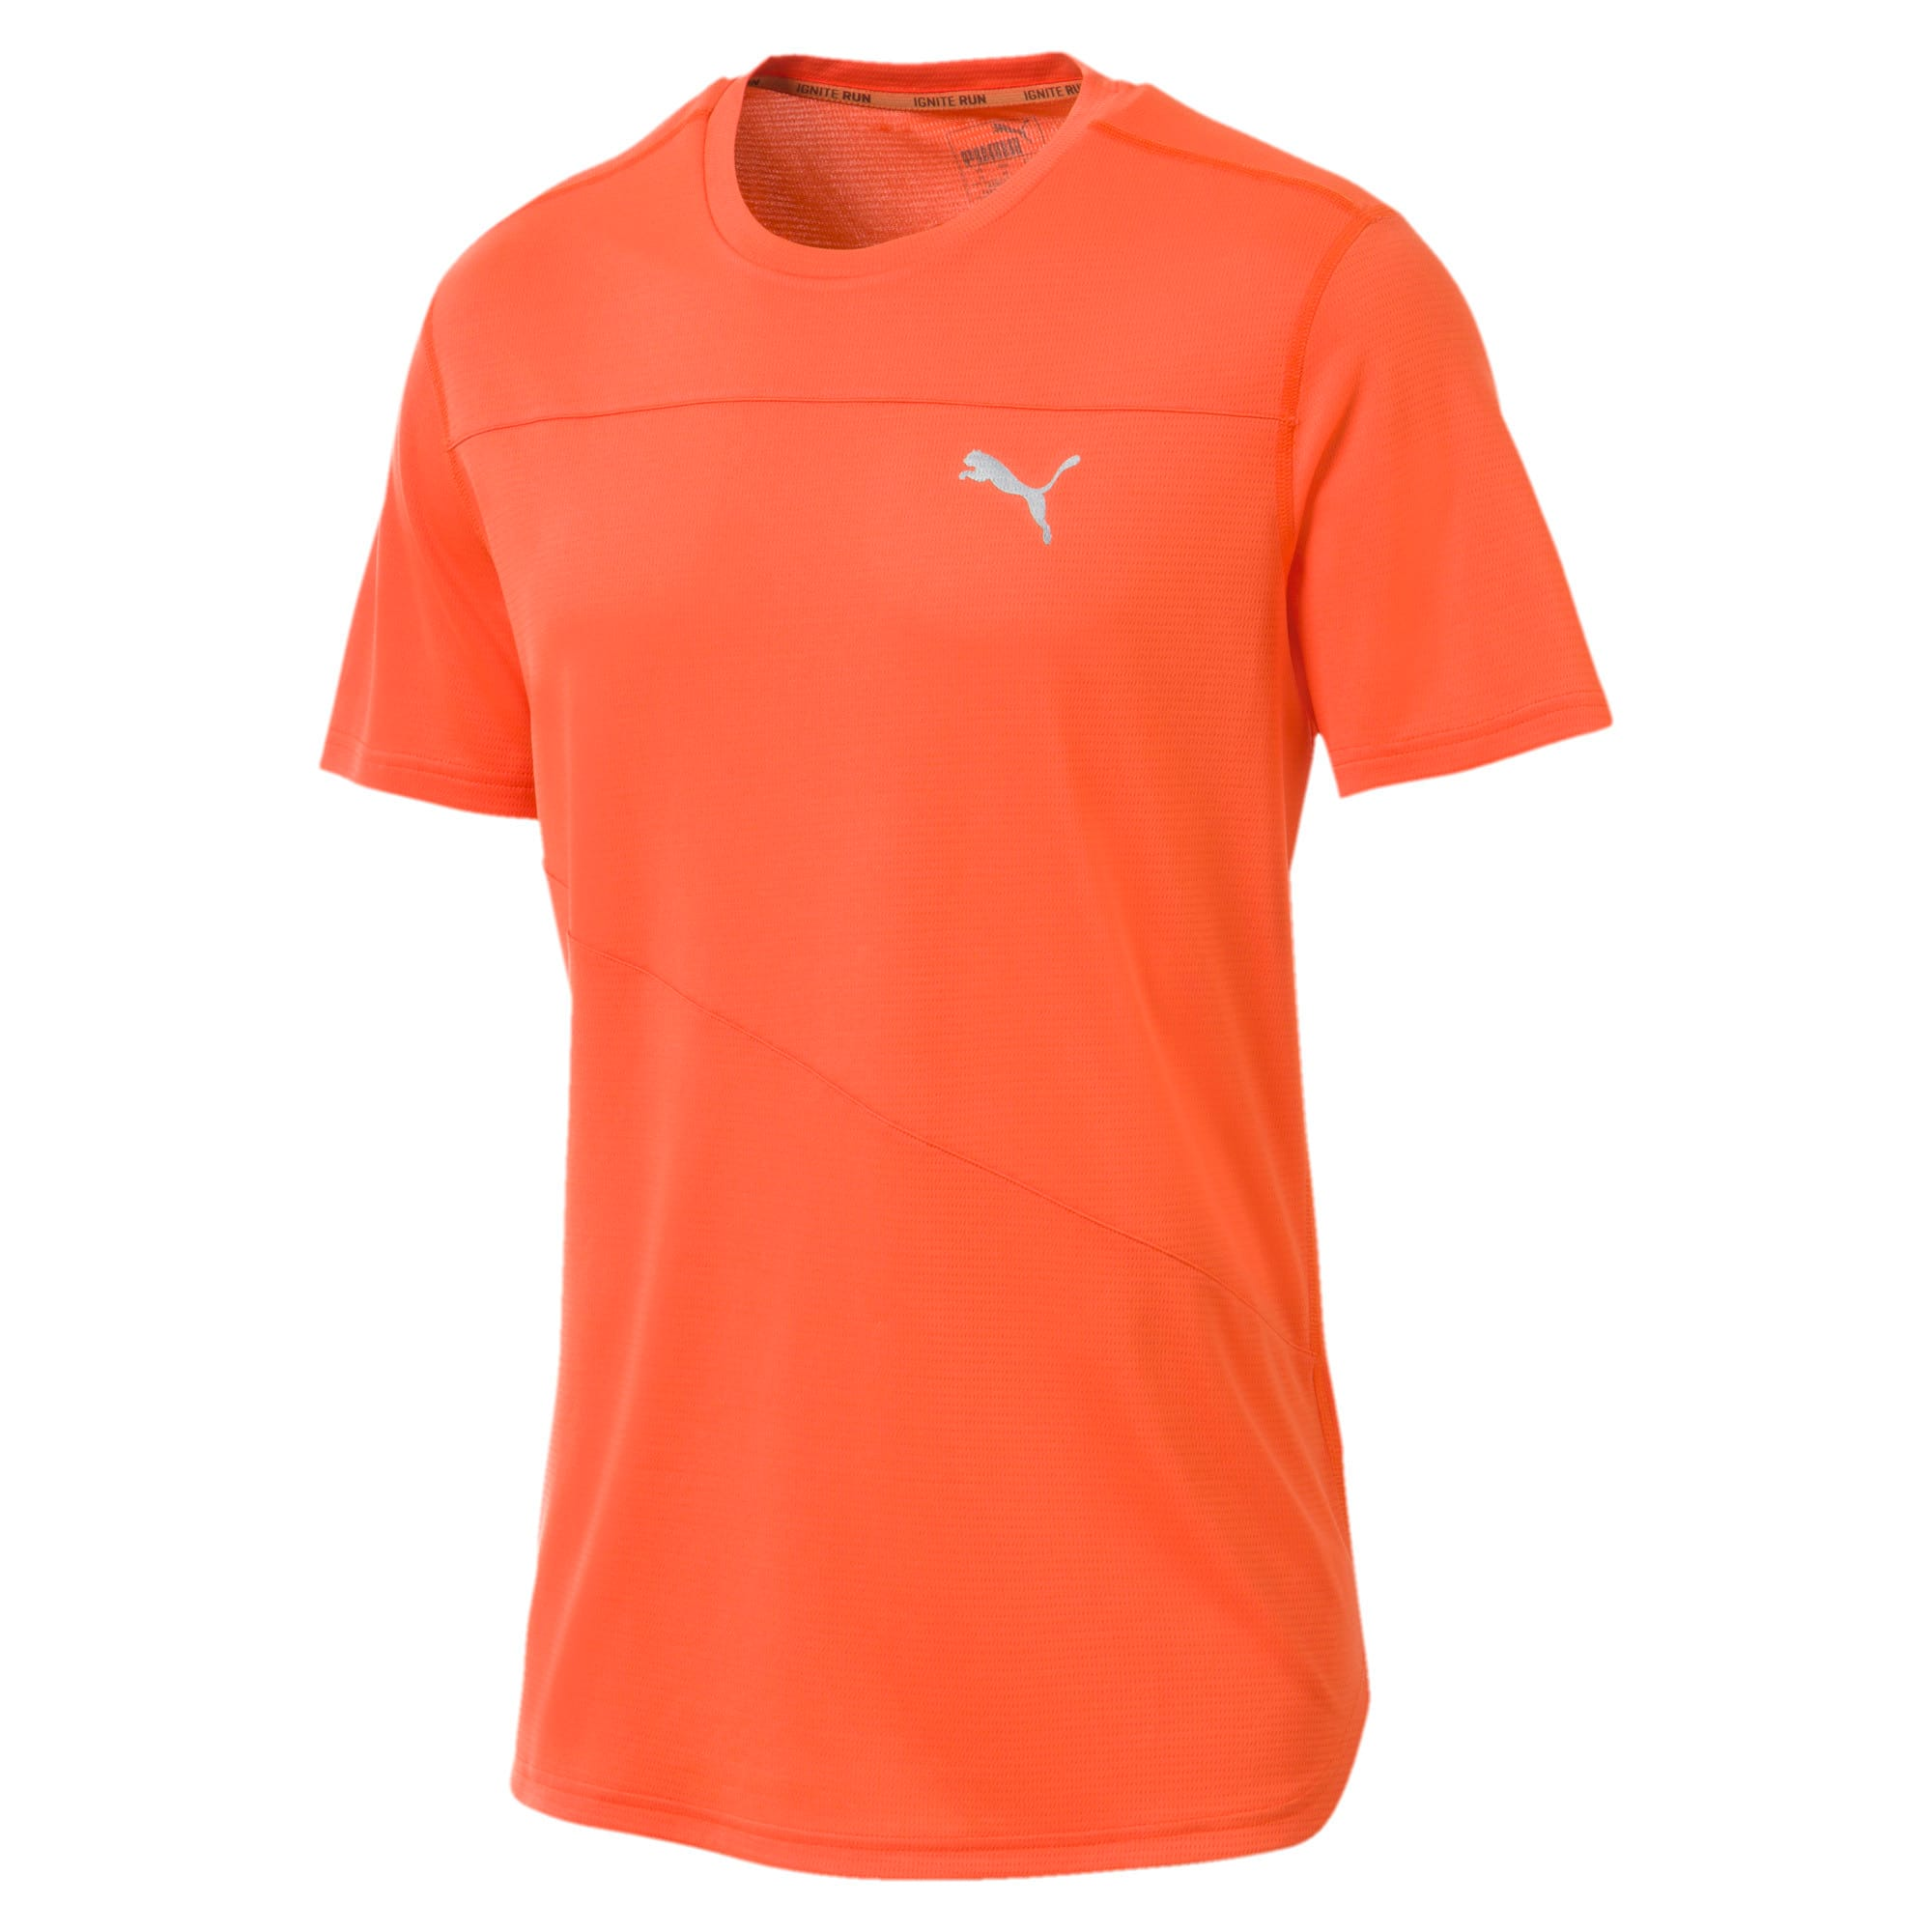 Thumbnail 4 of Running Men's IGNITE Mono T-Shirt, Firecracker, medium-IND